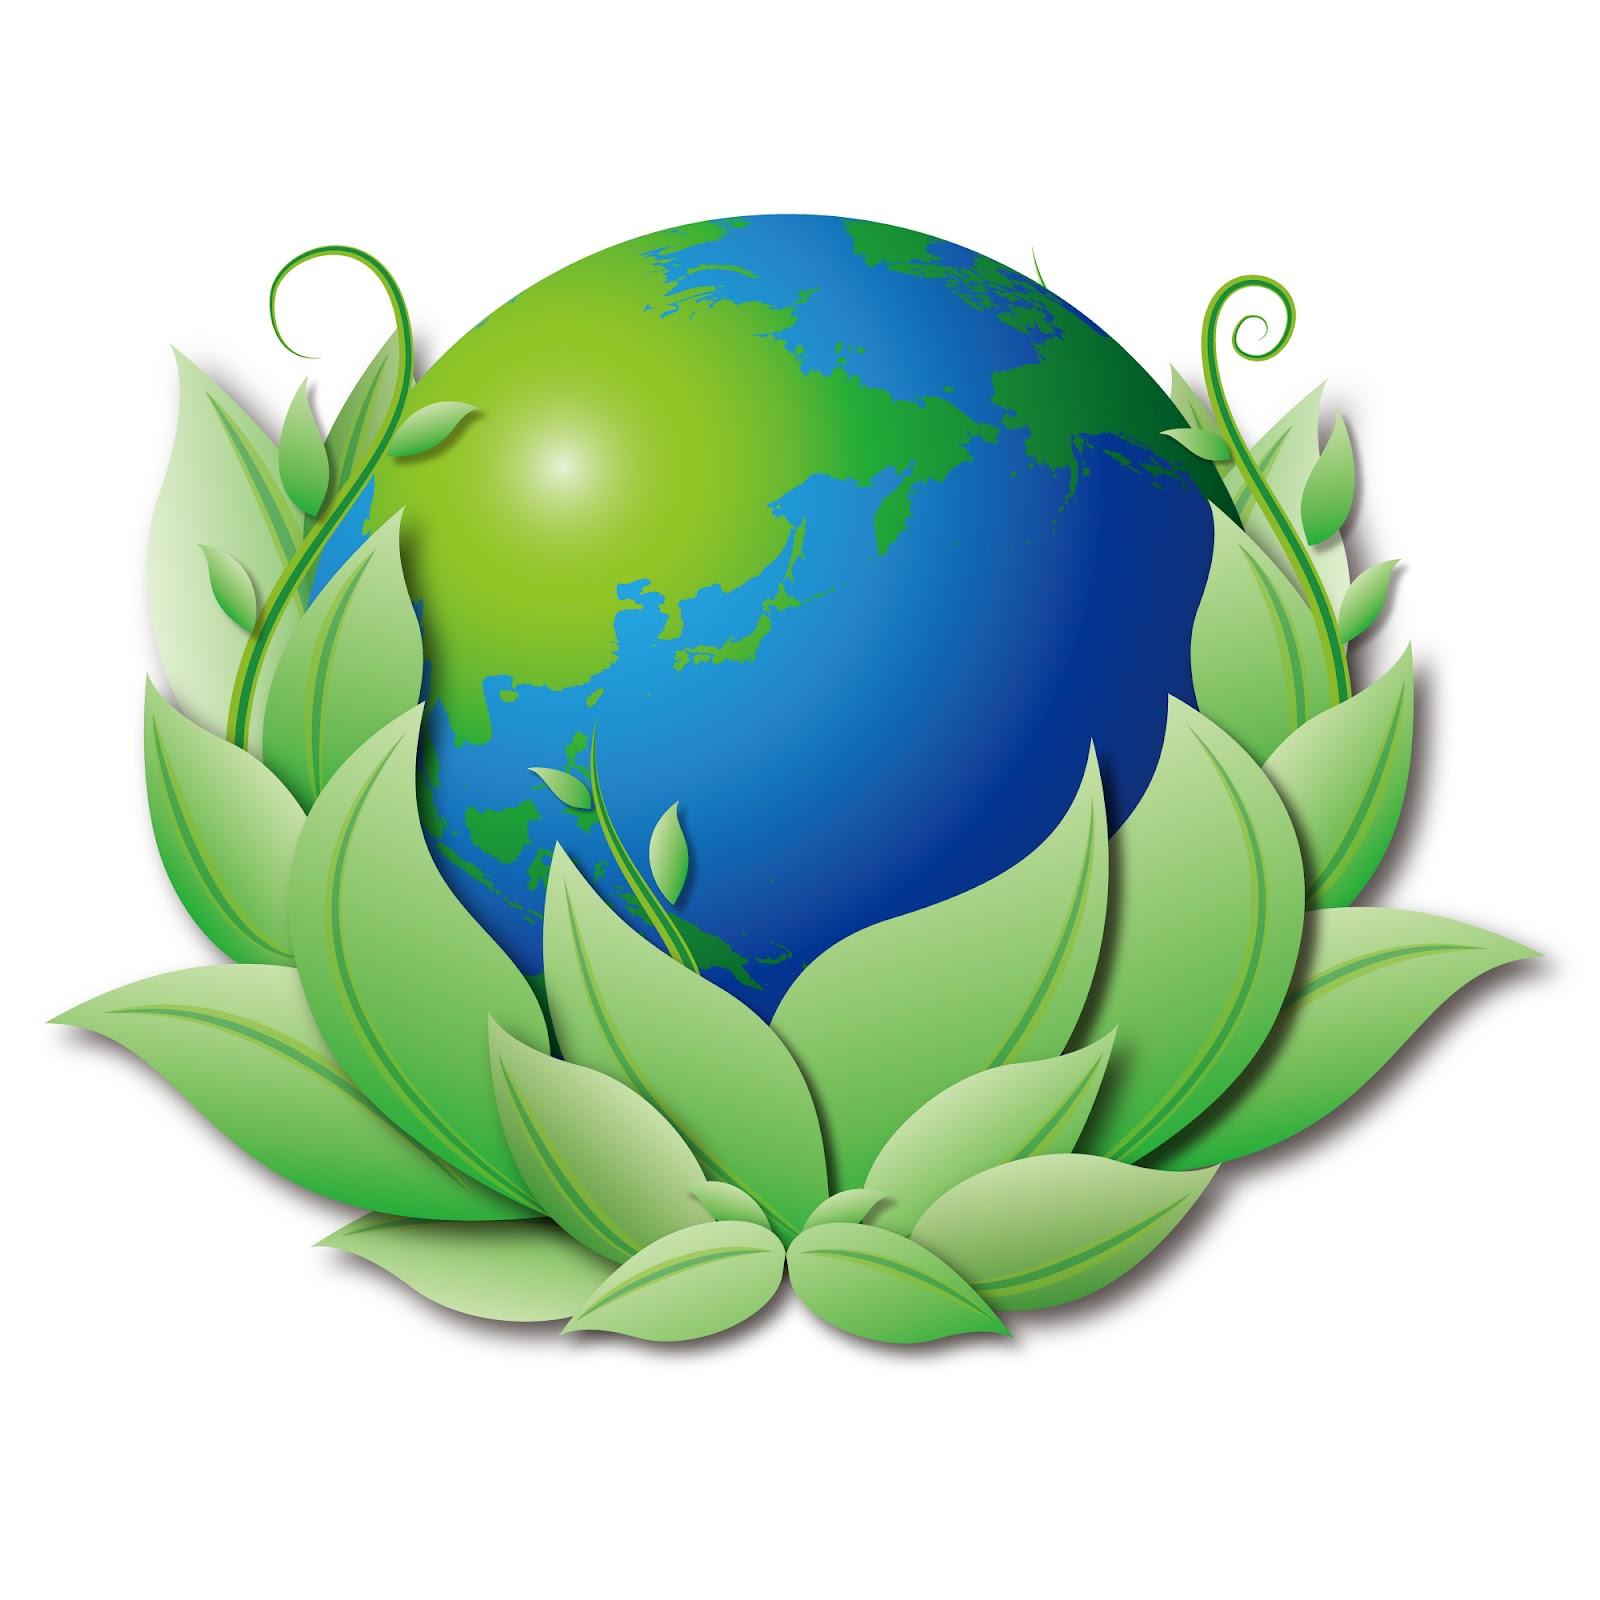 Green Day clipart healthy environment Day clip Environmental health art